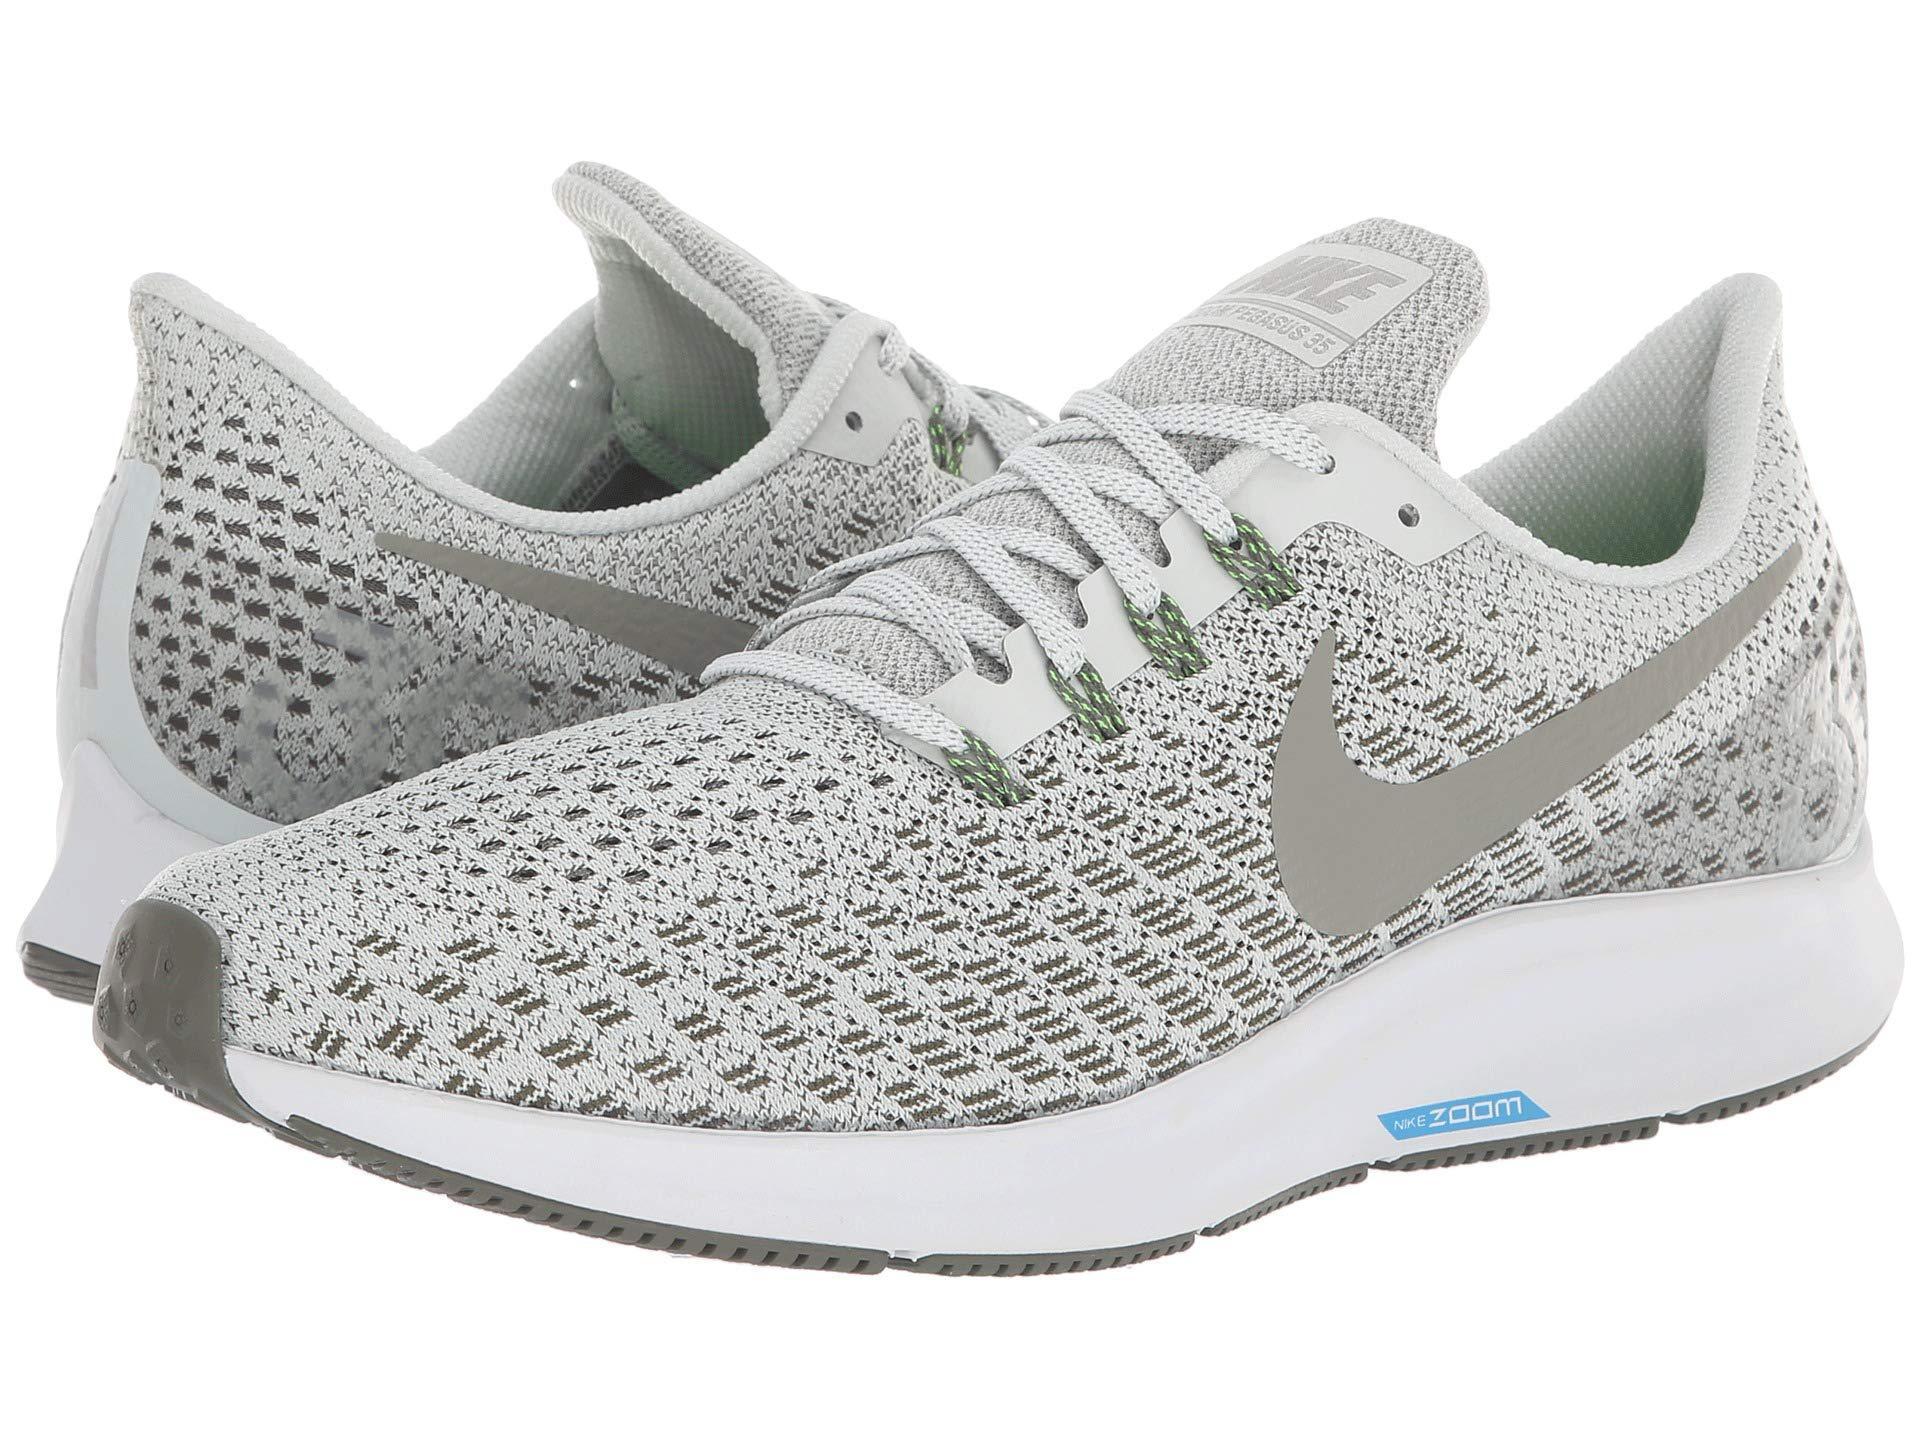 bab67f2275c2b Nike. Metallic Air Zoom Pegasus 35 (light Silver dark Stucco twilight  Marsh) Men s Running Shoes